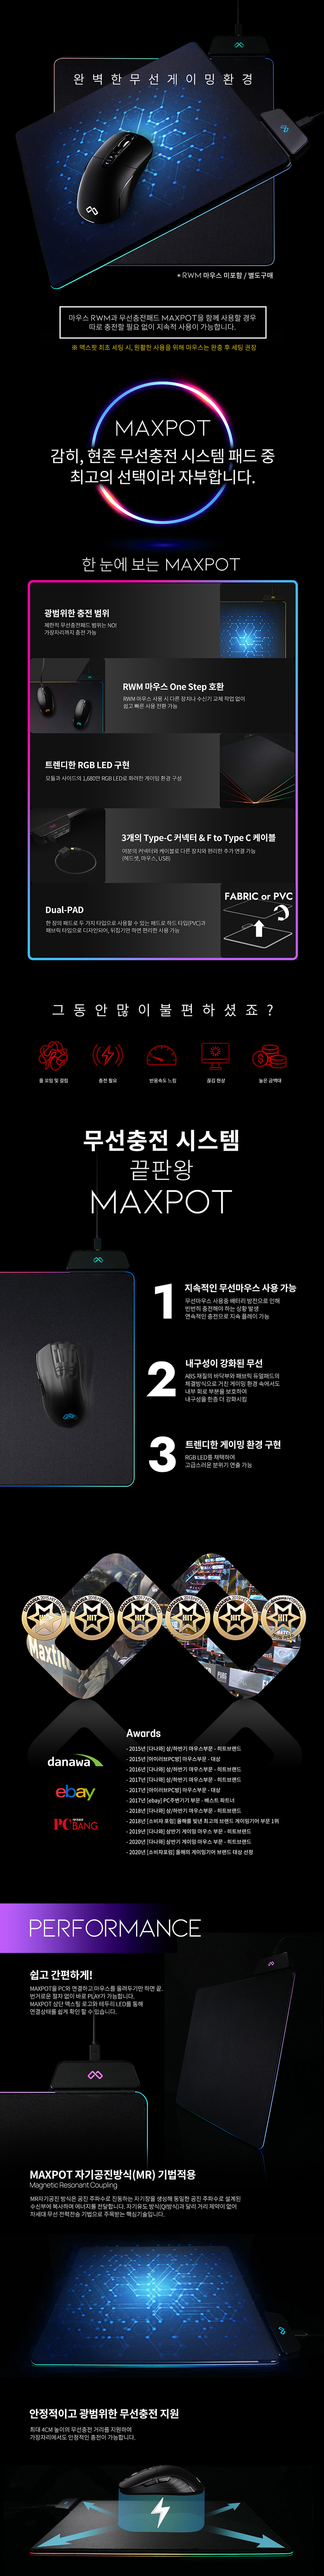 MAXTILL RATIO MAXPOT 마우스 무선충전패드